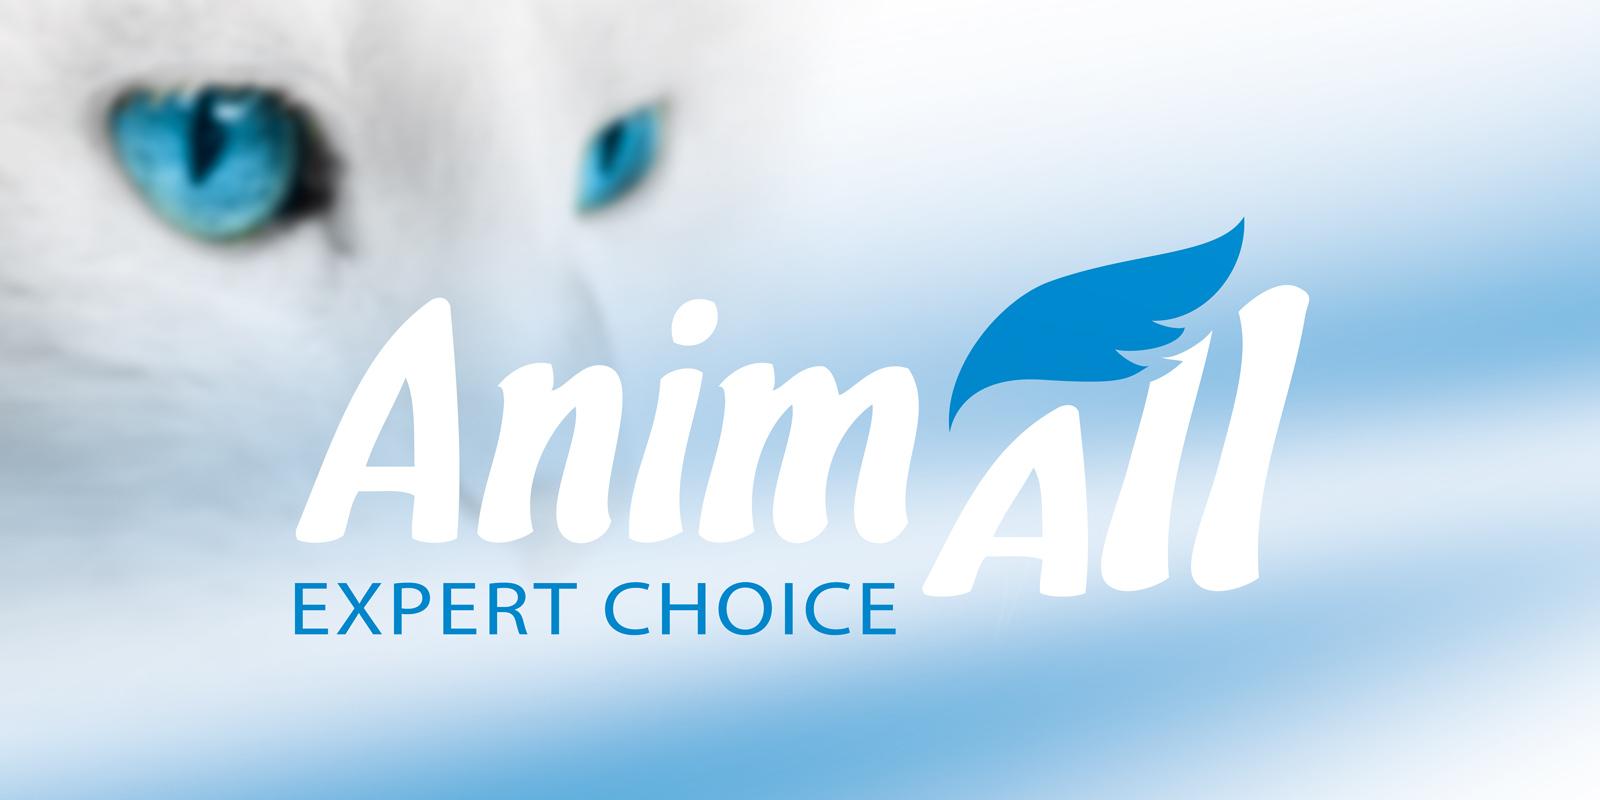 TM Animall;;;;;;Разработка логотипа;;;;;;<span>Клиент:</span> TM Animall;;;;;;;;;;;;Разработка логотипа;;;;;;1